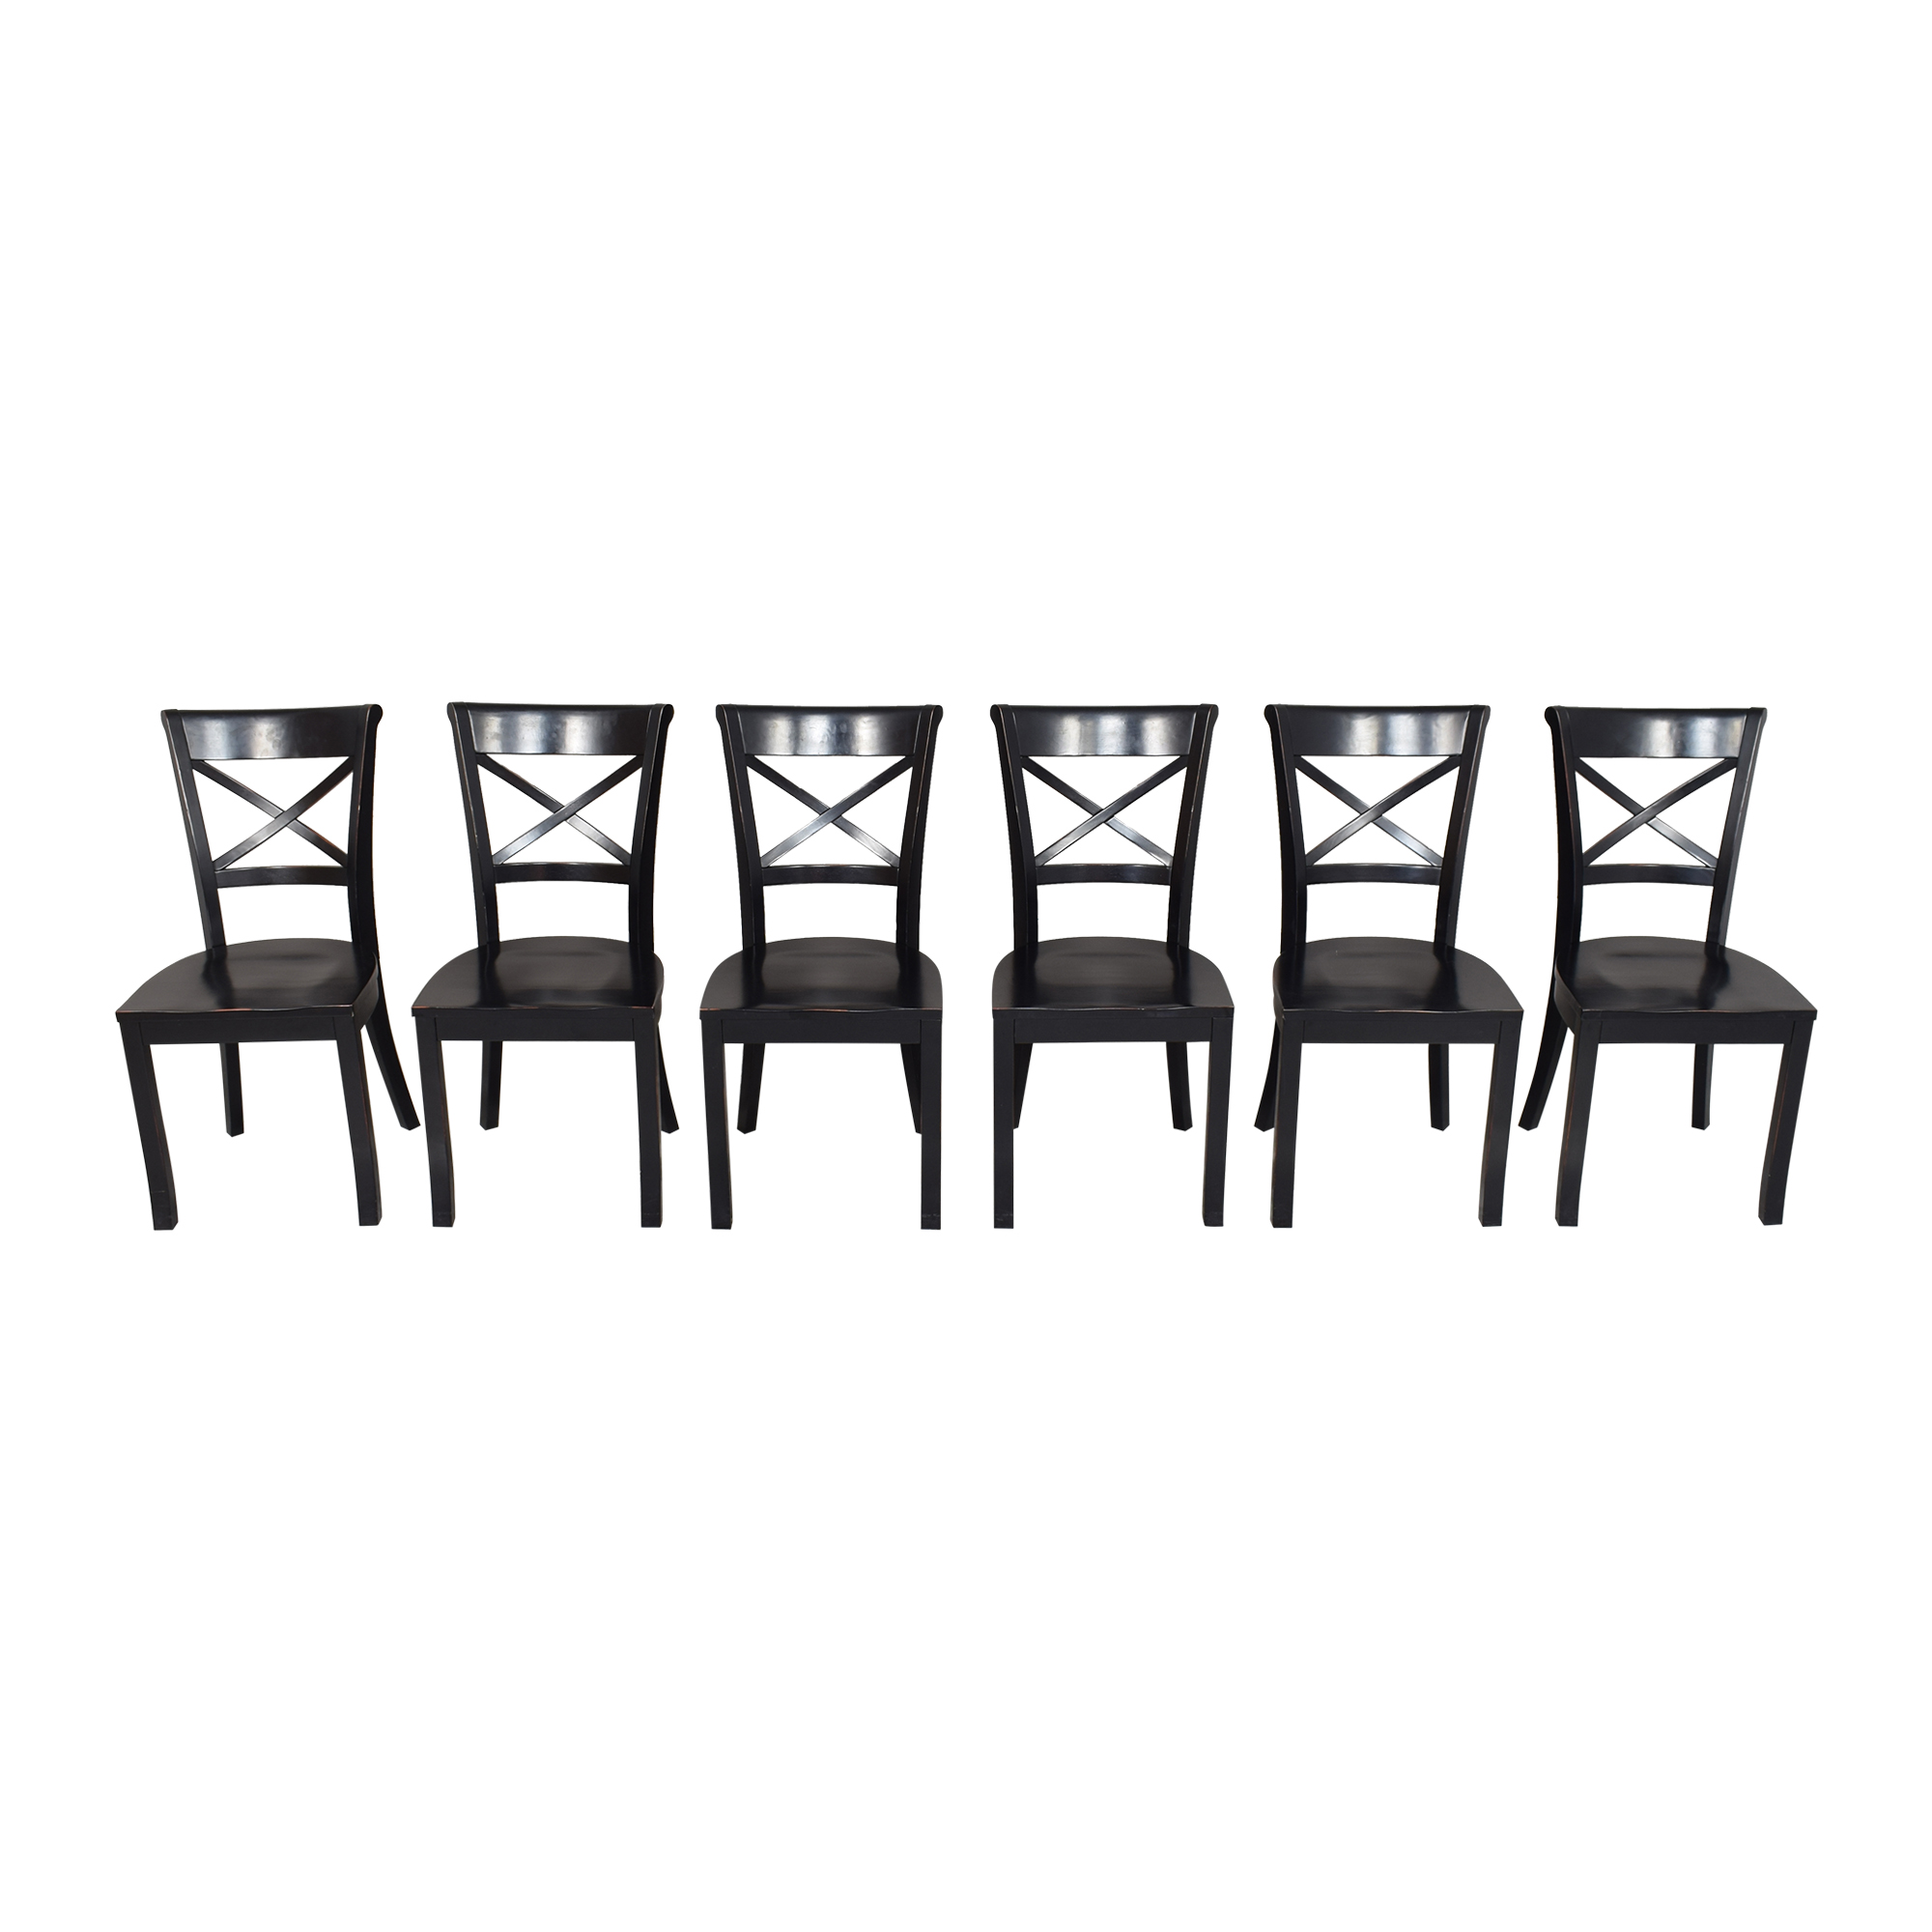 Crate & Barrel Crate & Barrel Vintner X Back Dining Chairs nj